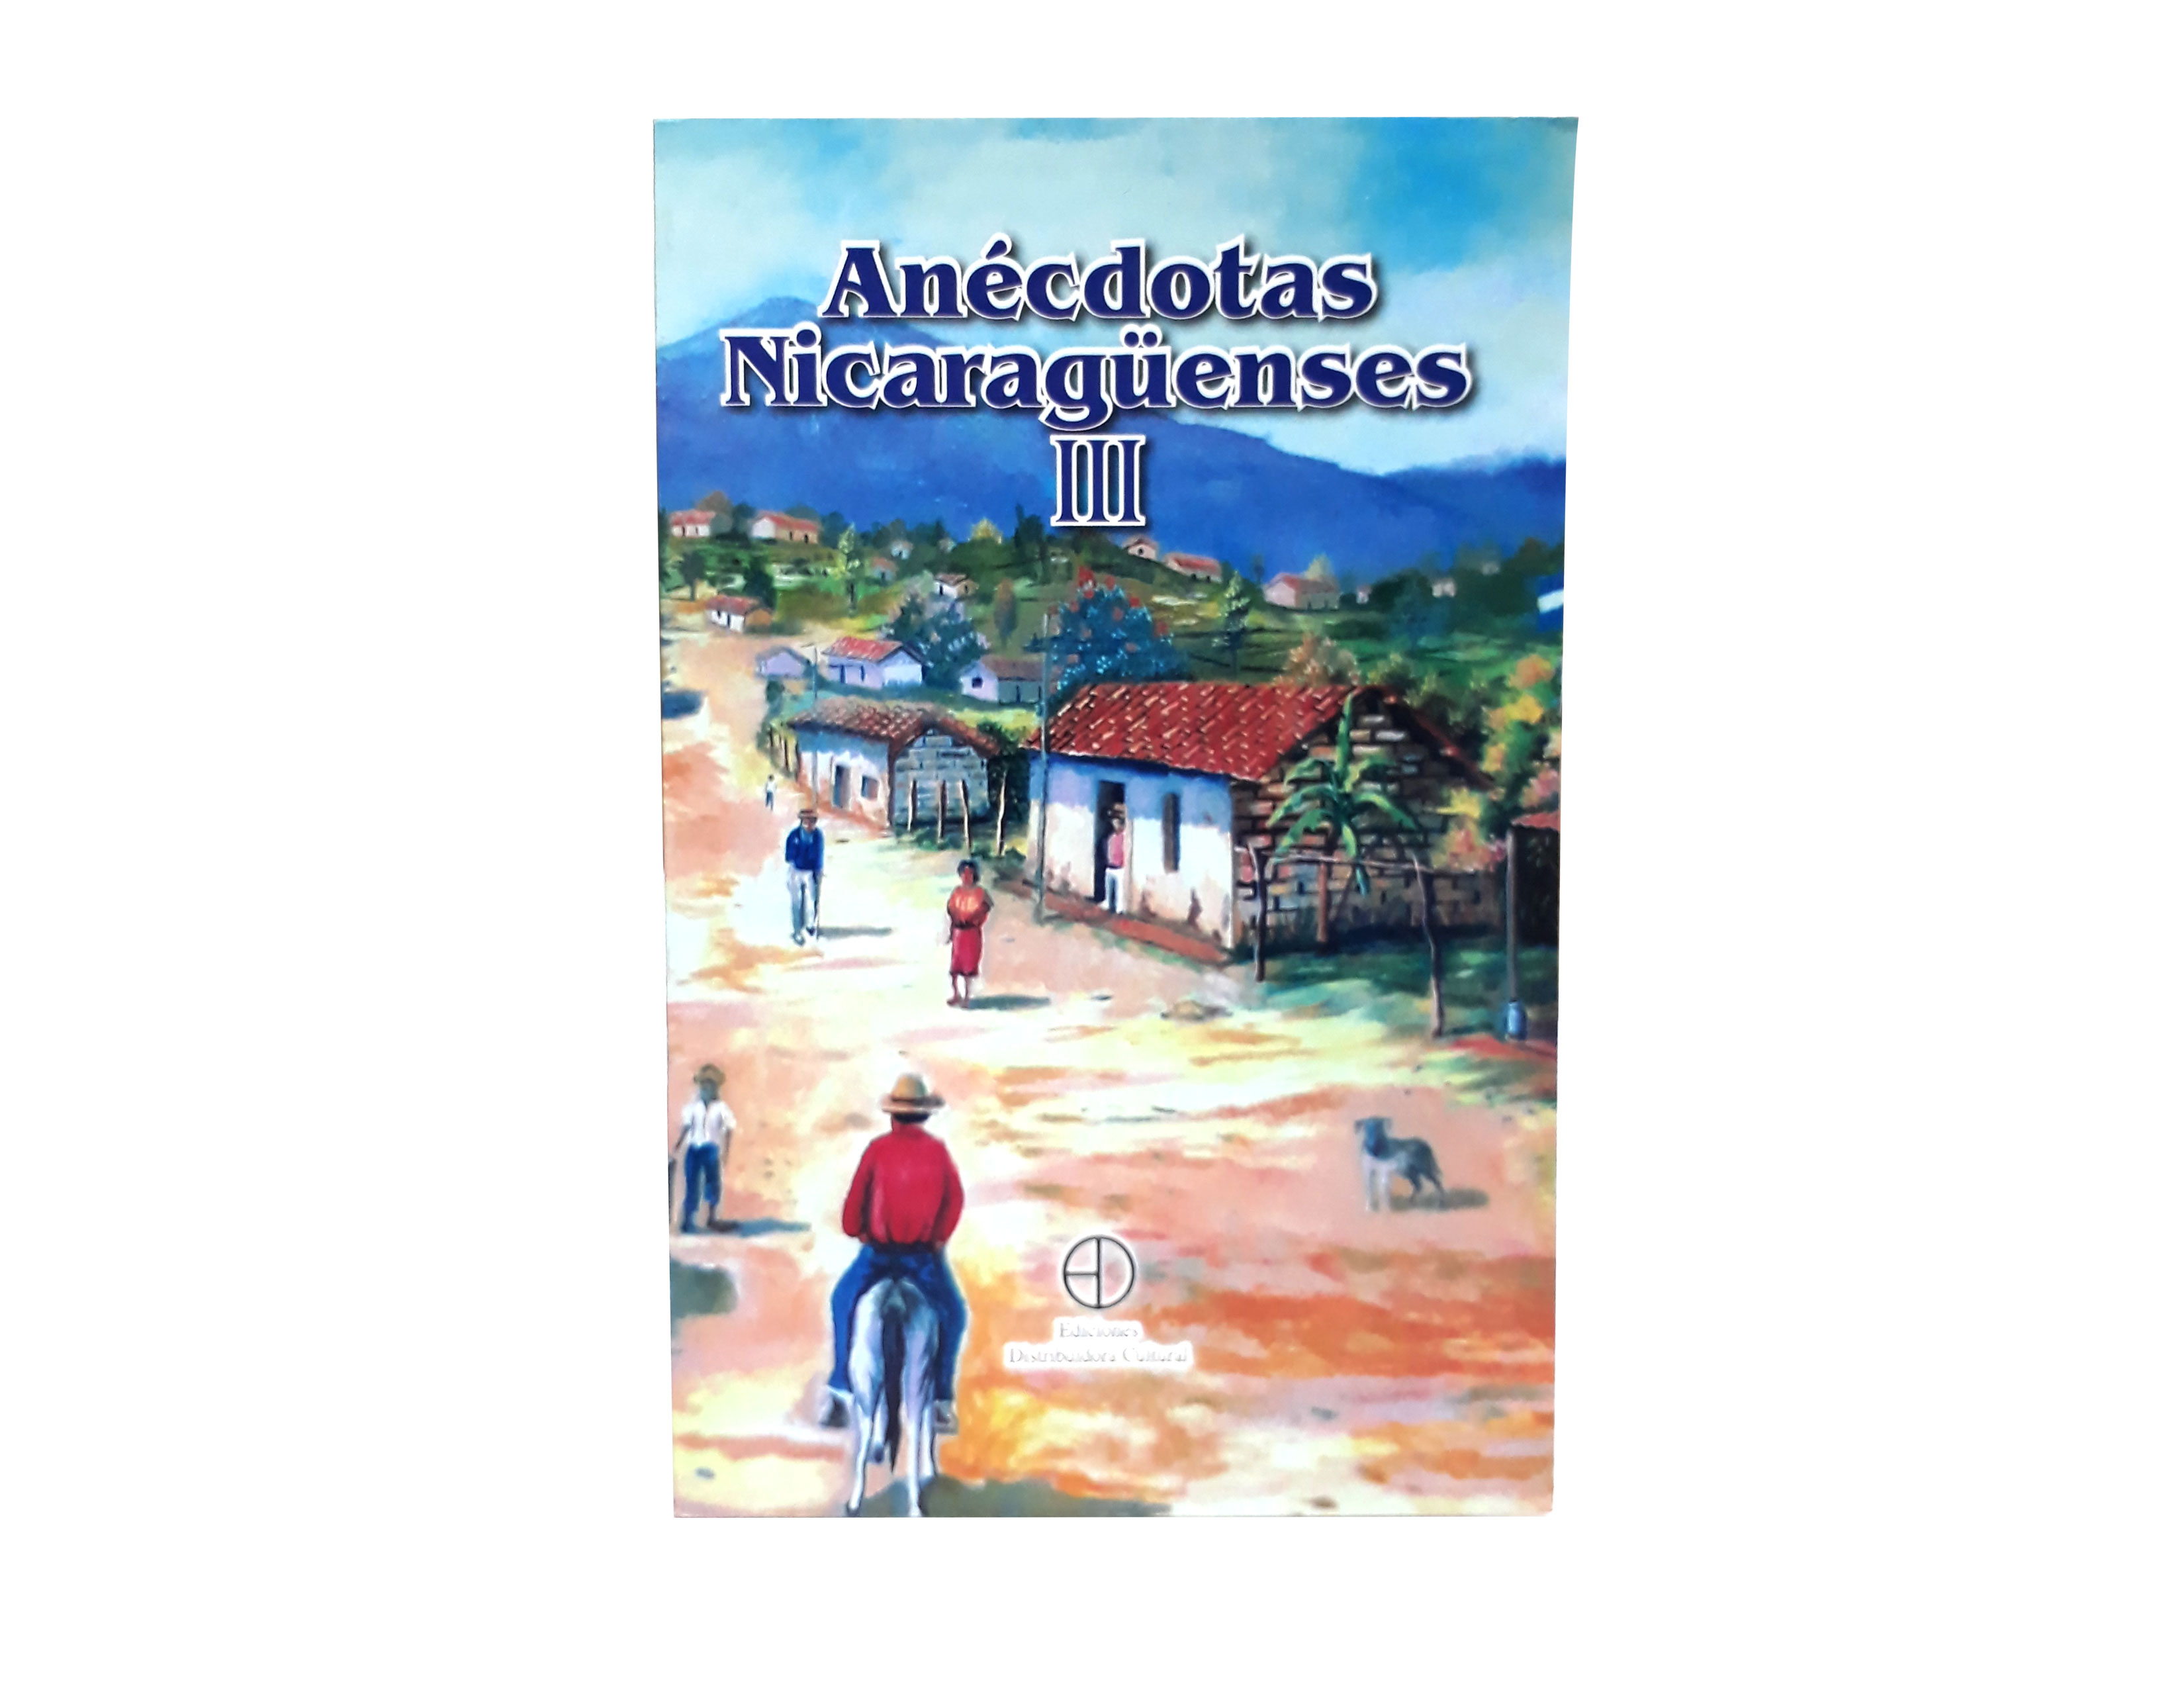 ANECDOTAS NICARAGUENSES III